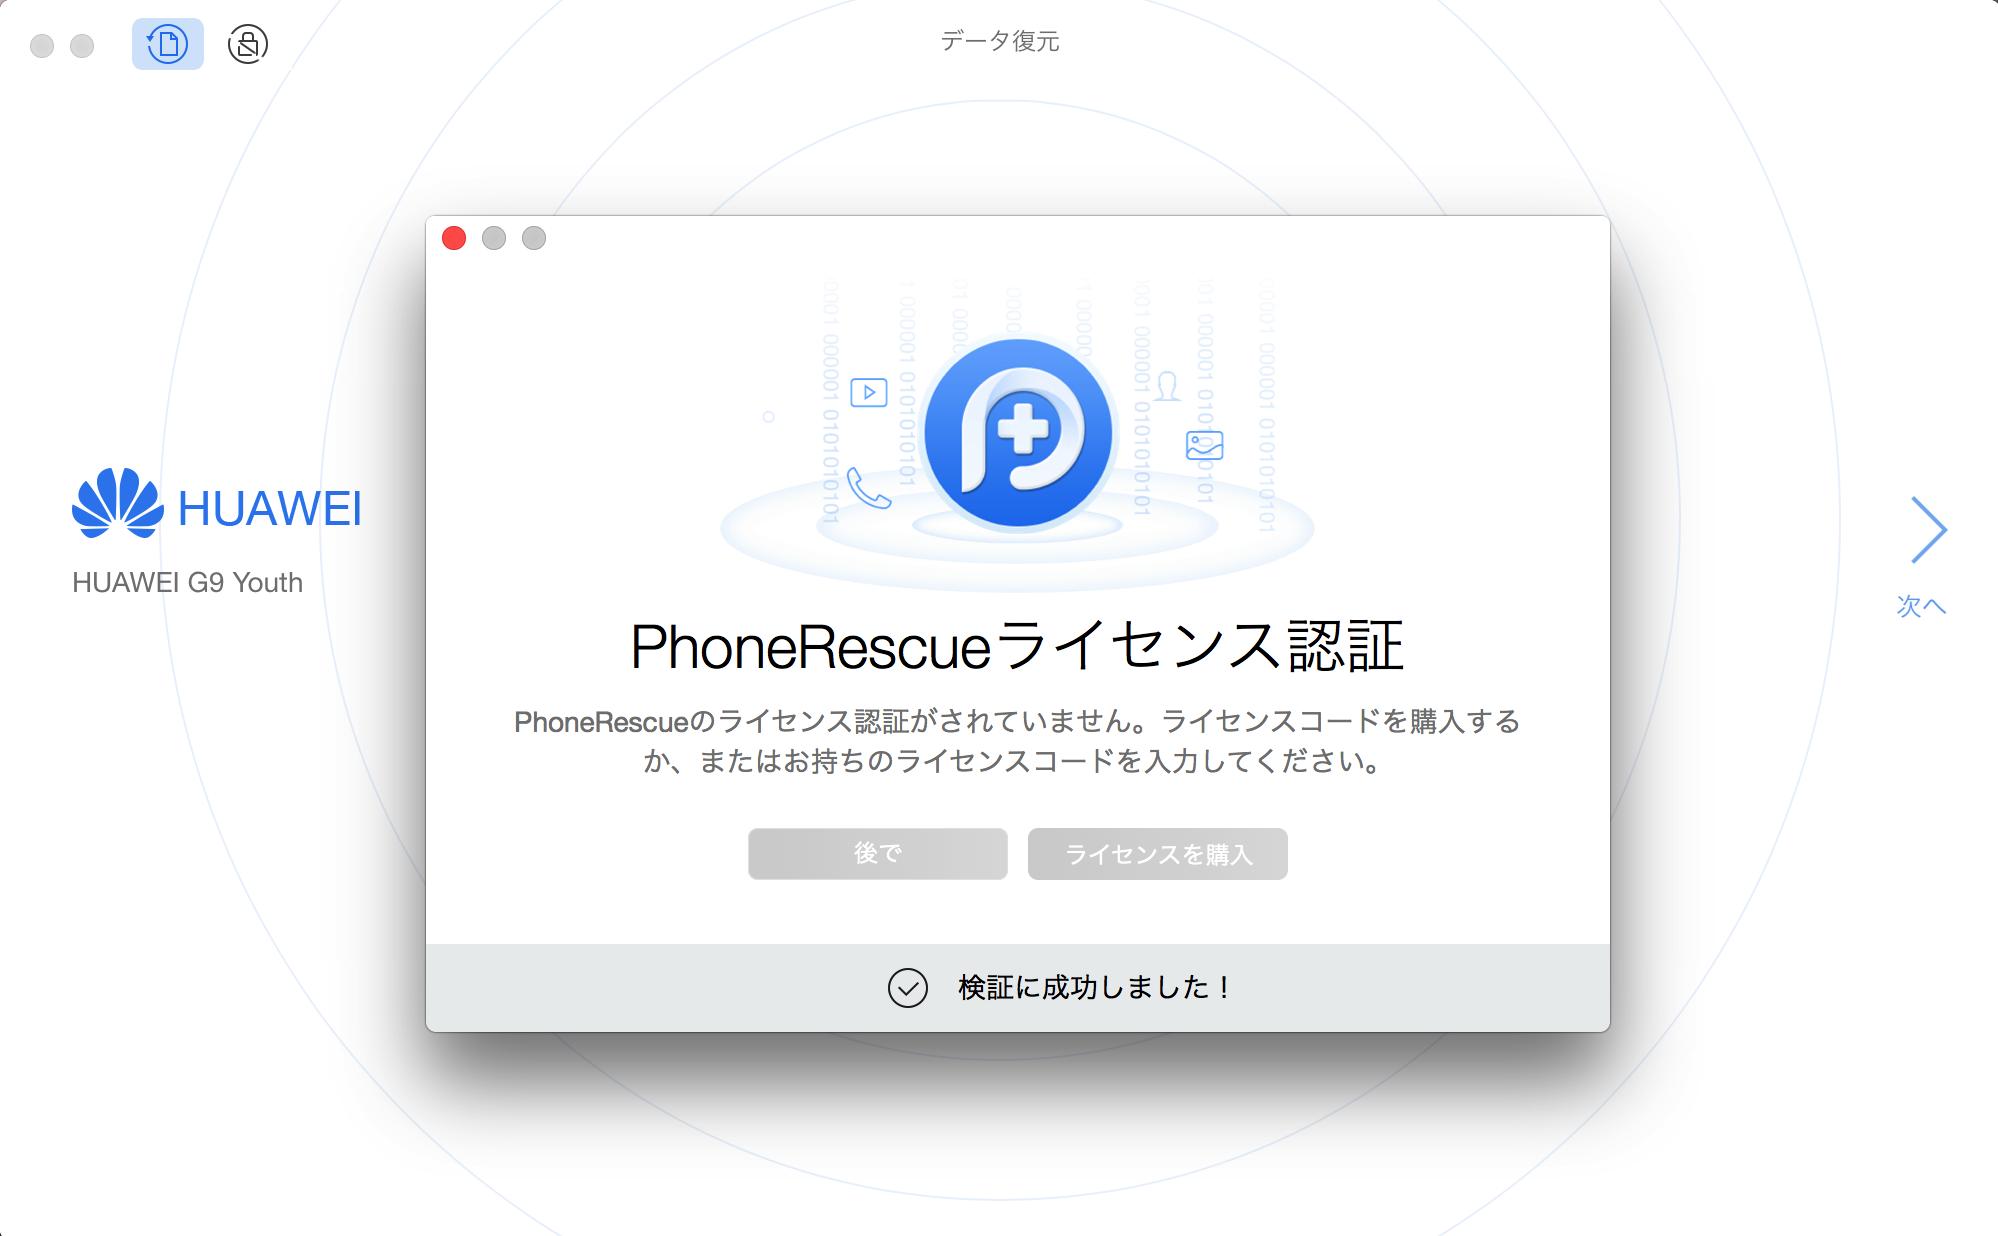 PhoneRescue - HUAWEIデータ復元をうまく登録する